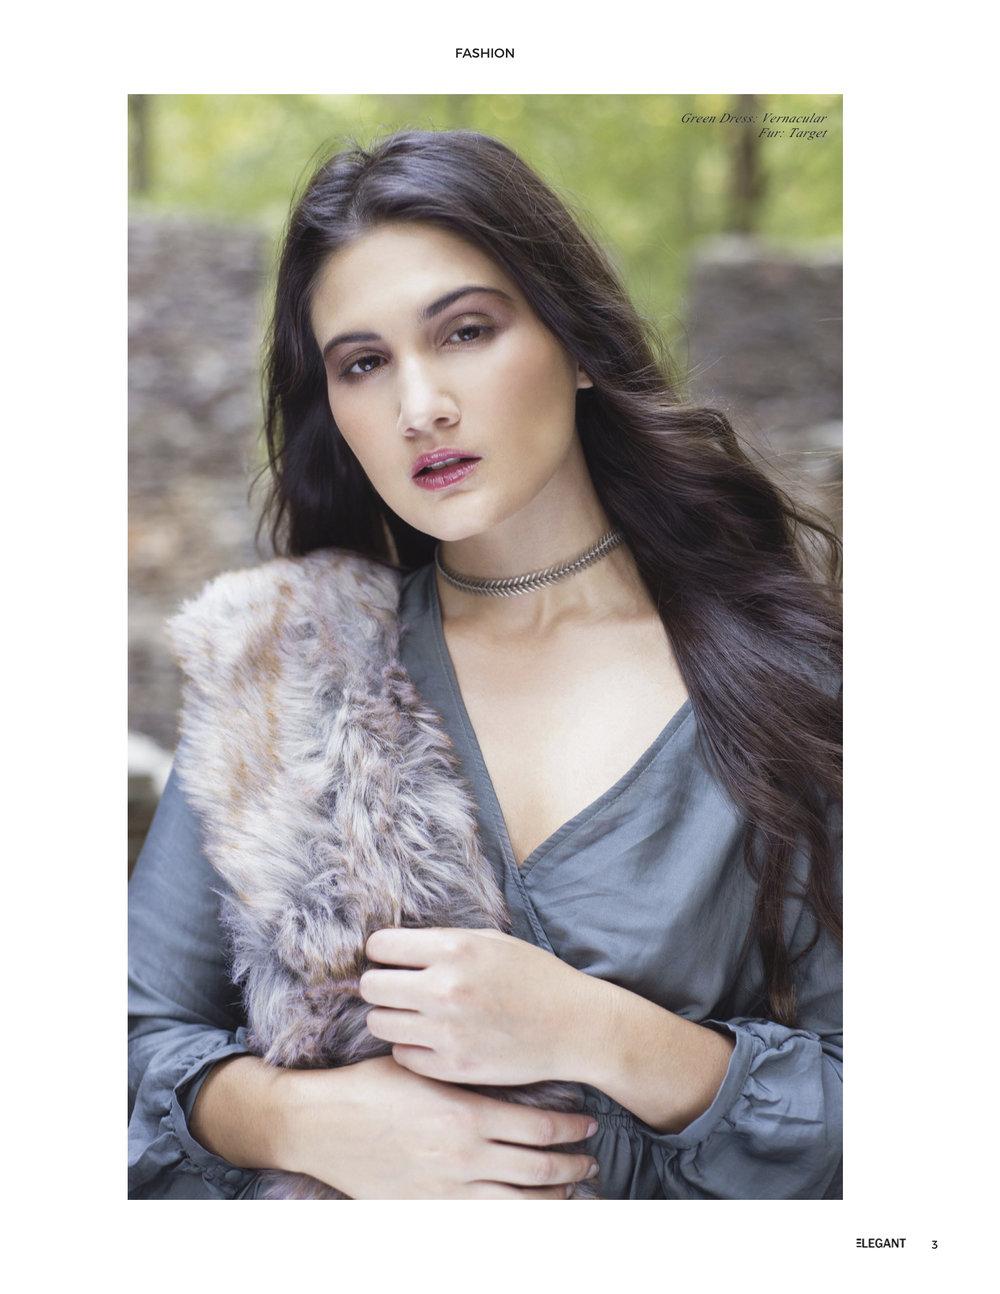 Elegant Magazine December 2017  Model: Ashley D'Antignac  Agency: Click Models of Atlanta  Makeup & Hair: Alicia Smith  Stylist: Carol Jenksy  Assistant Retoucher: Lindsey Bolas